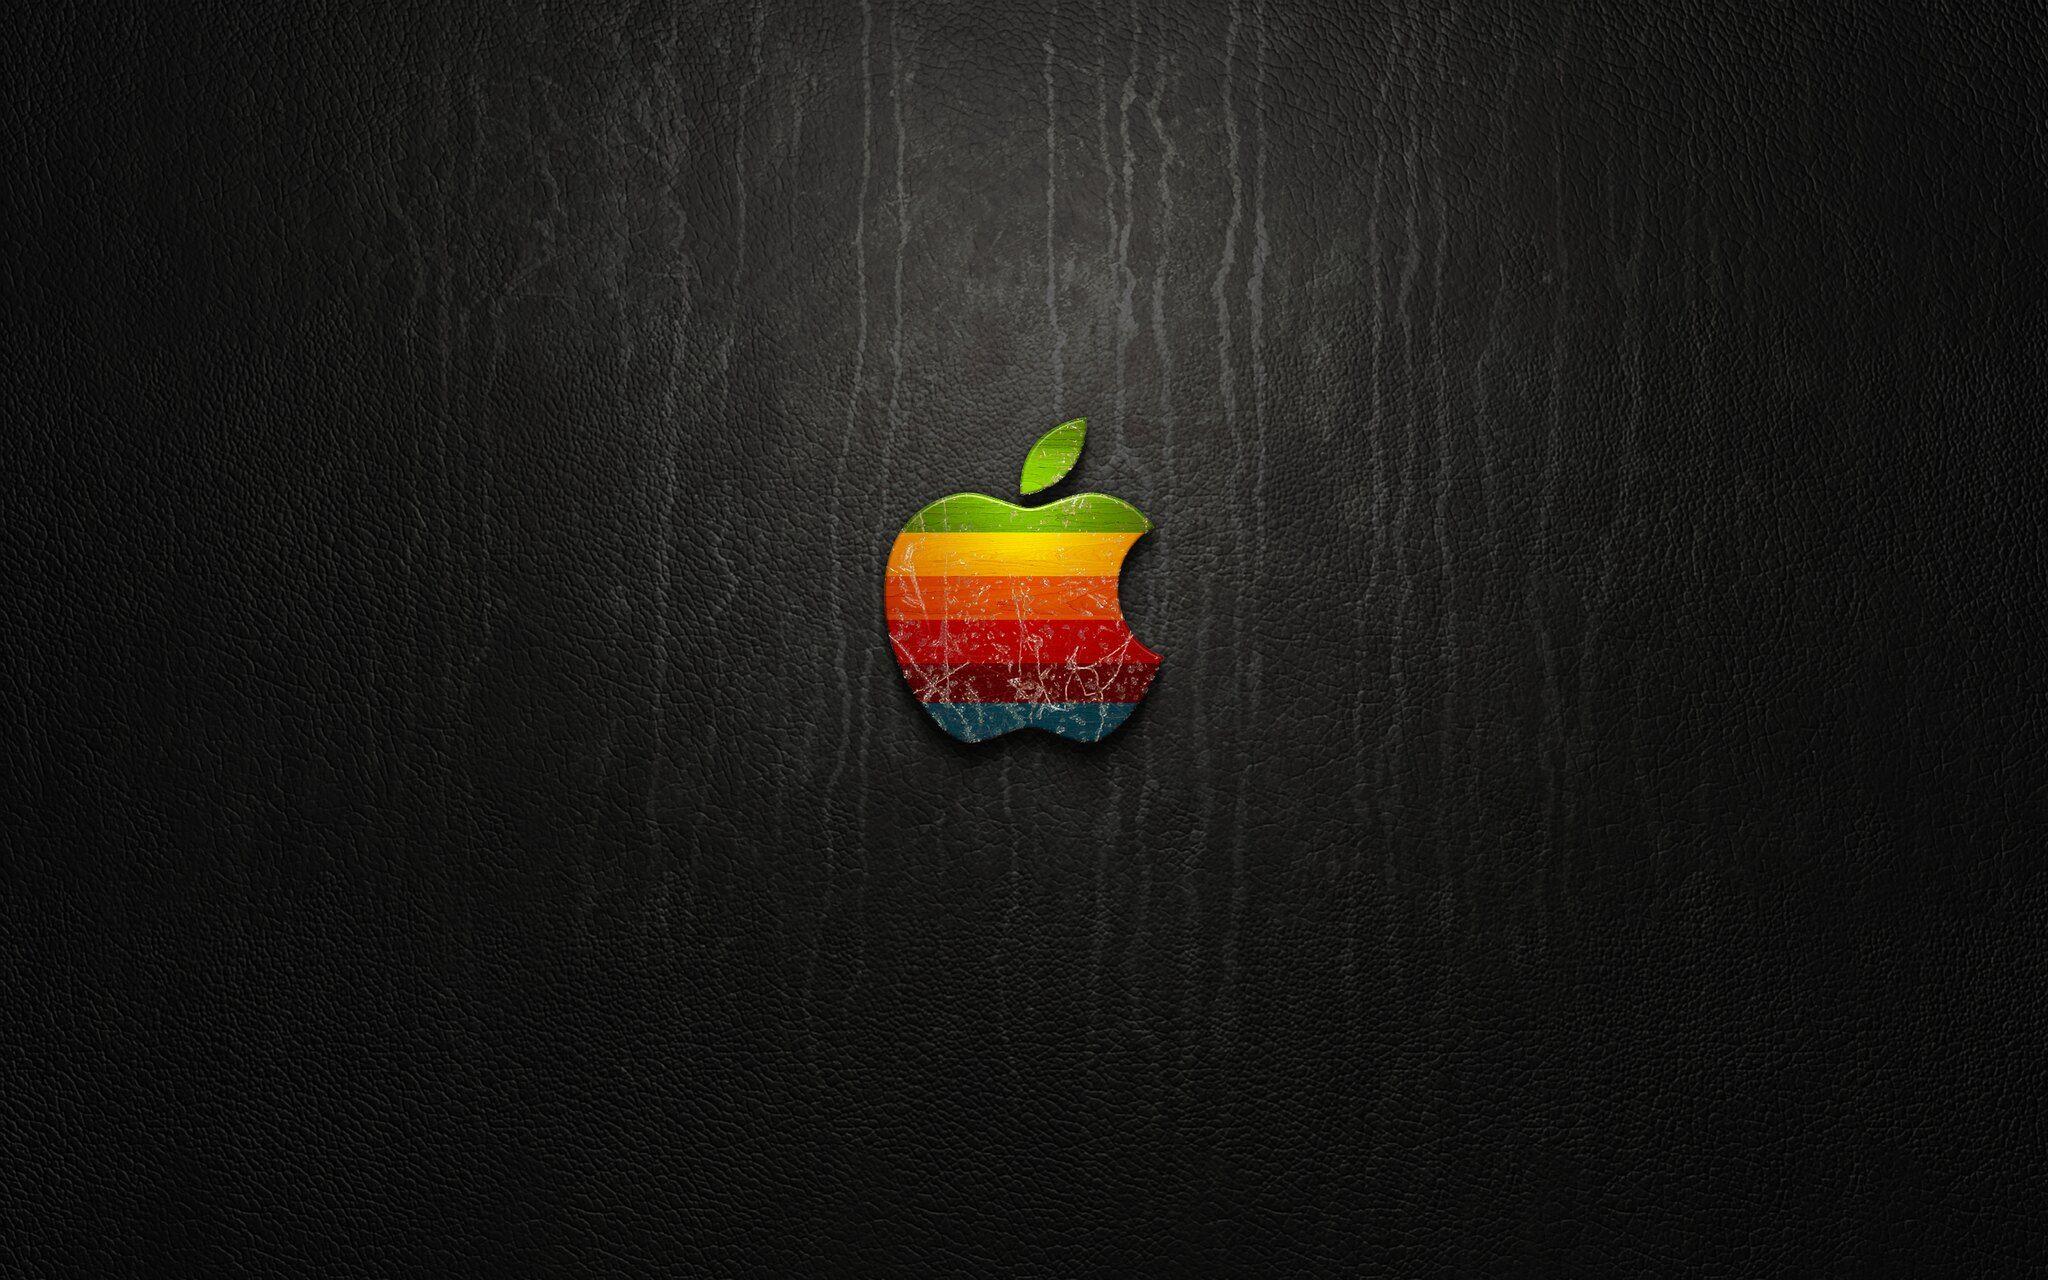 Apple Wallpaper Black In 2021 Apple Wallpaper 4k Wallpapers For Pc Wallpaper Pc